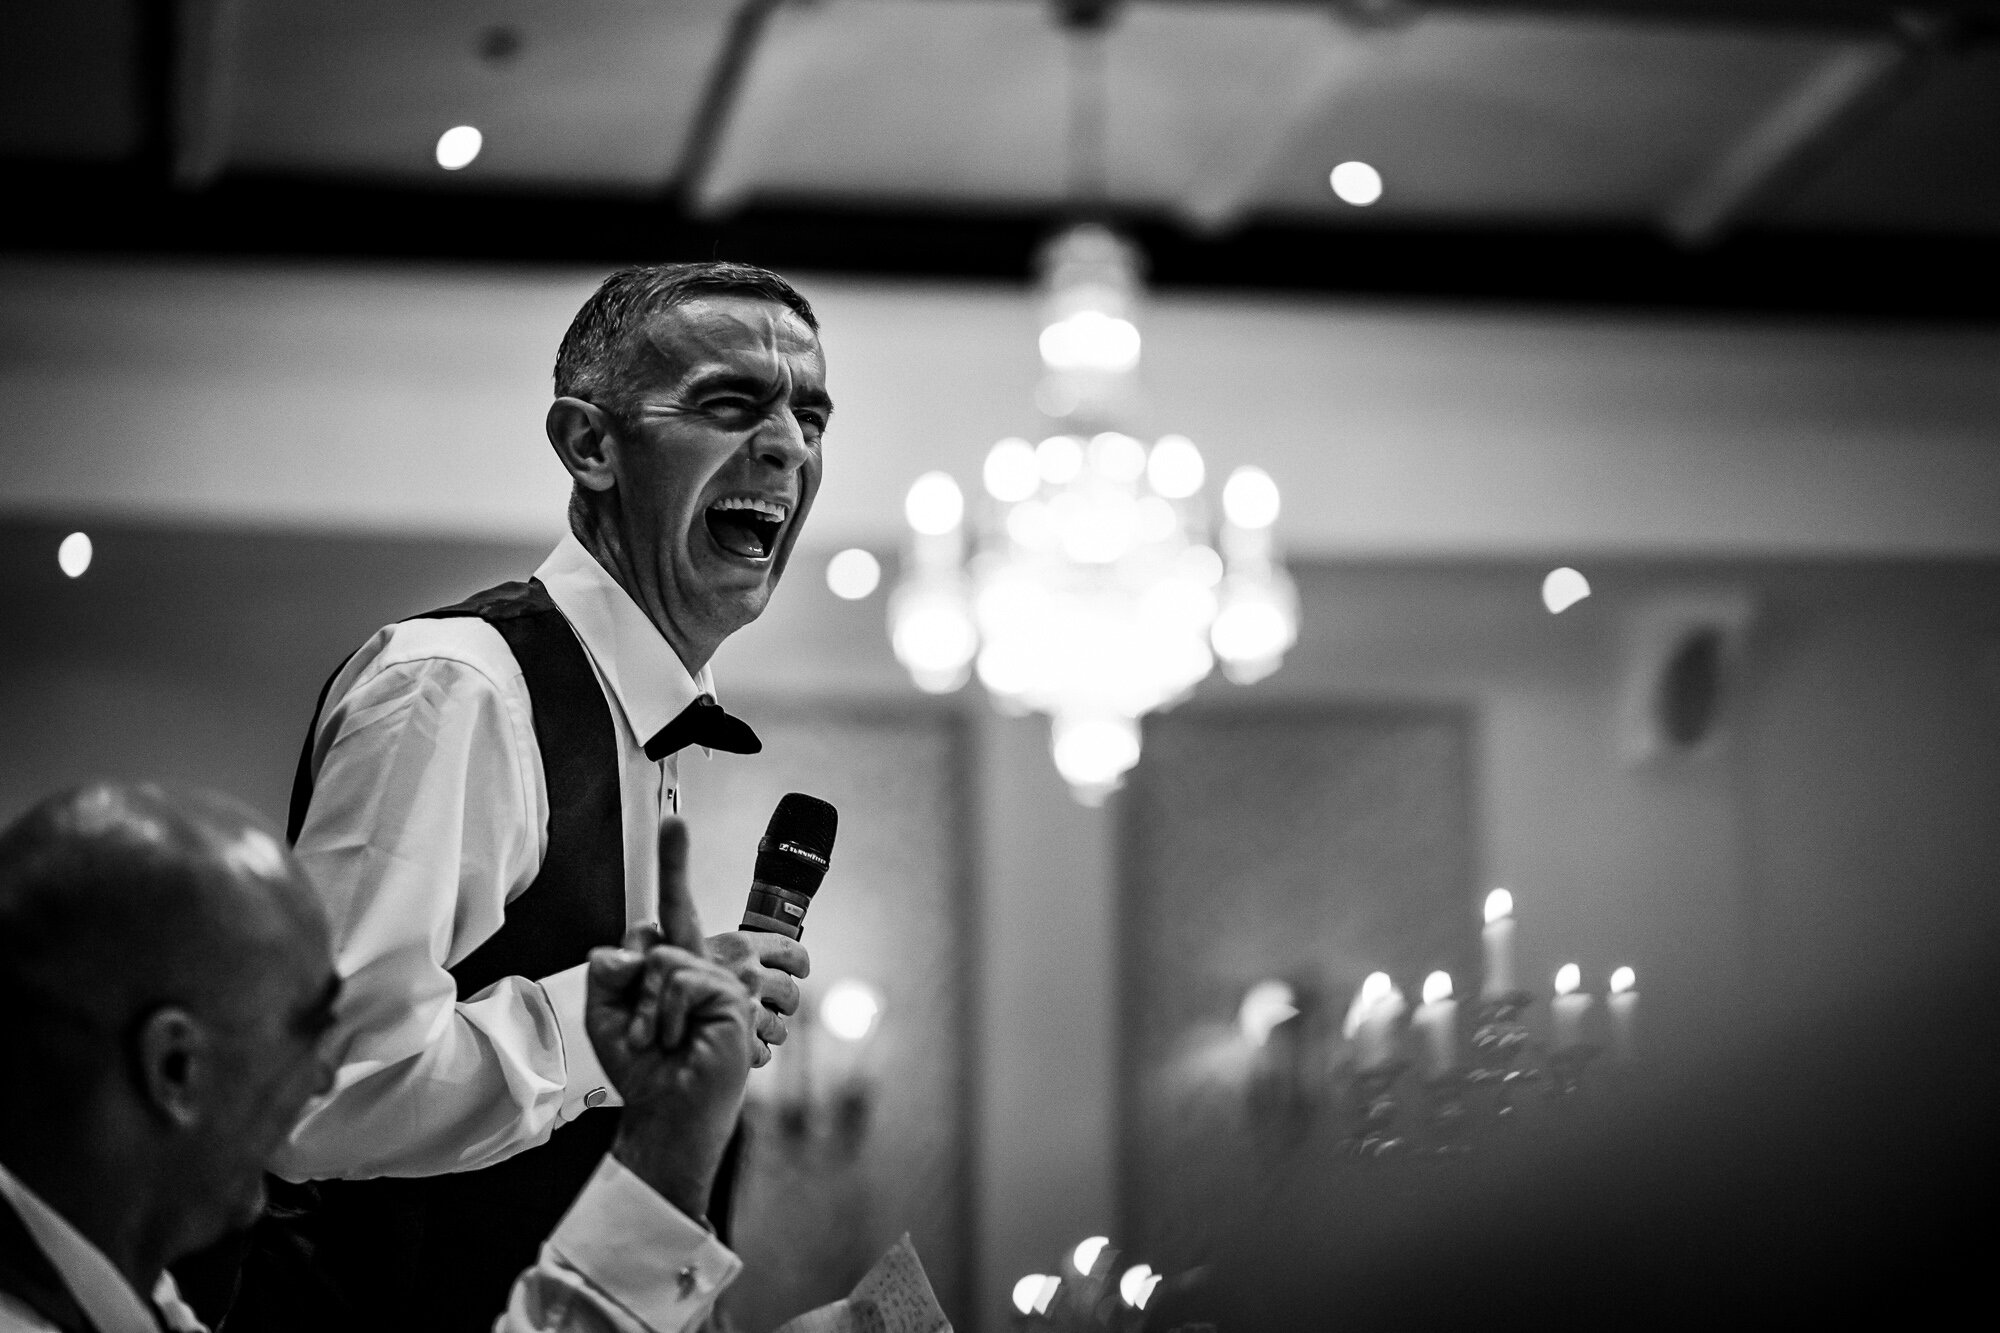 Clontarf Caste wedding photographer Wedding Photography dublin ireland wedding photographer (46 of 58).jpg